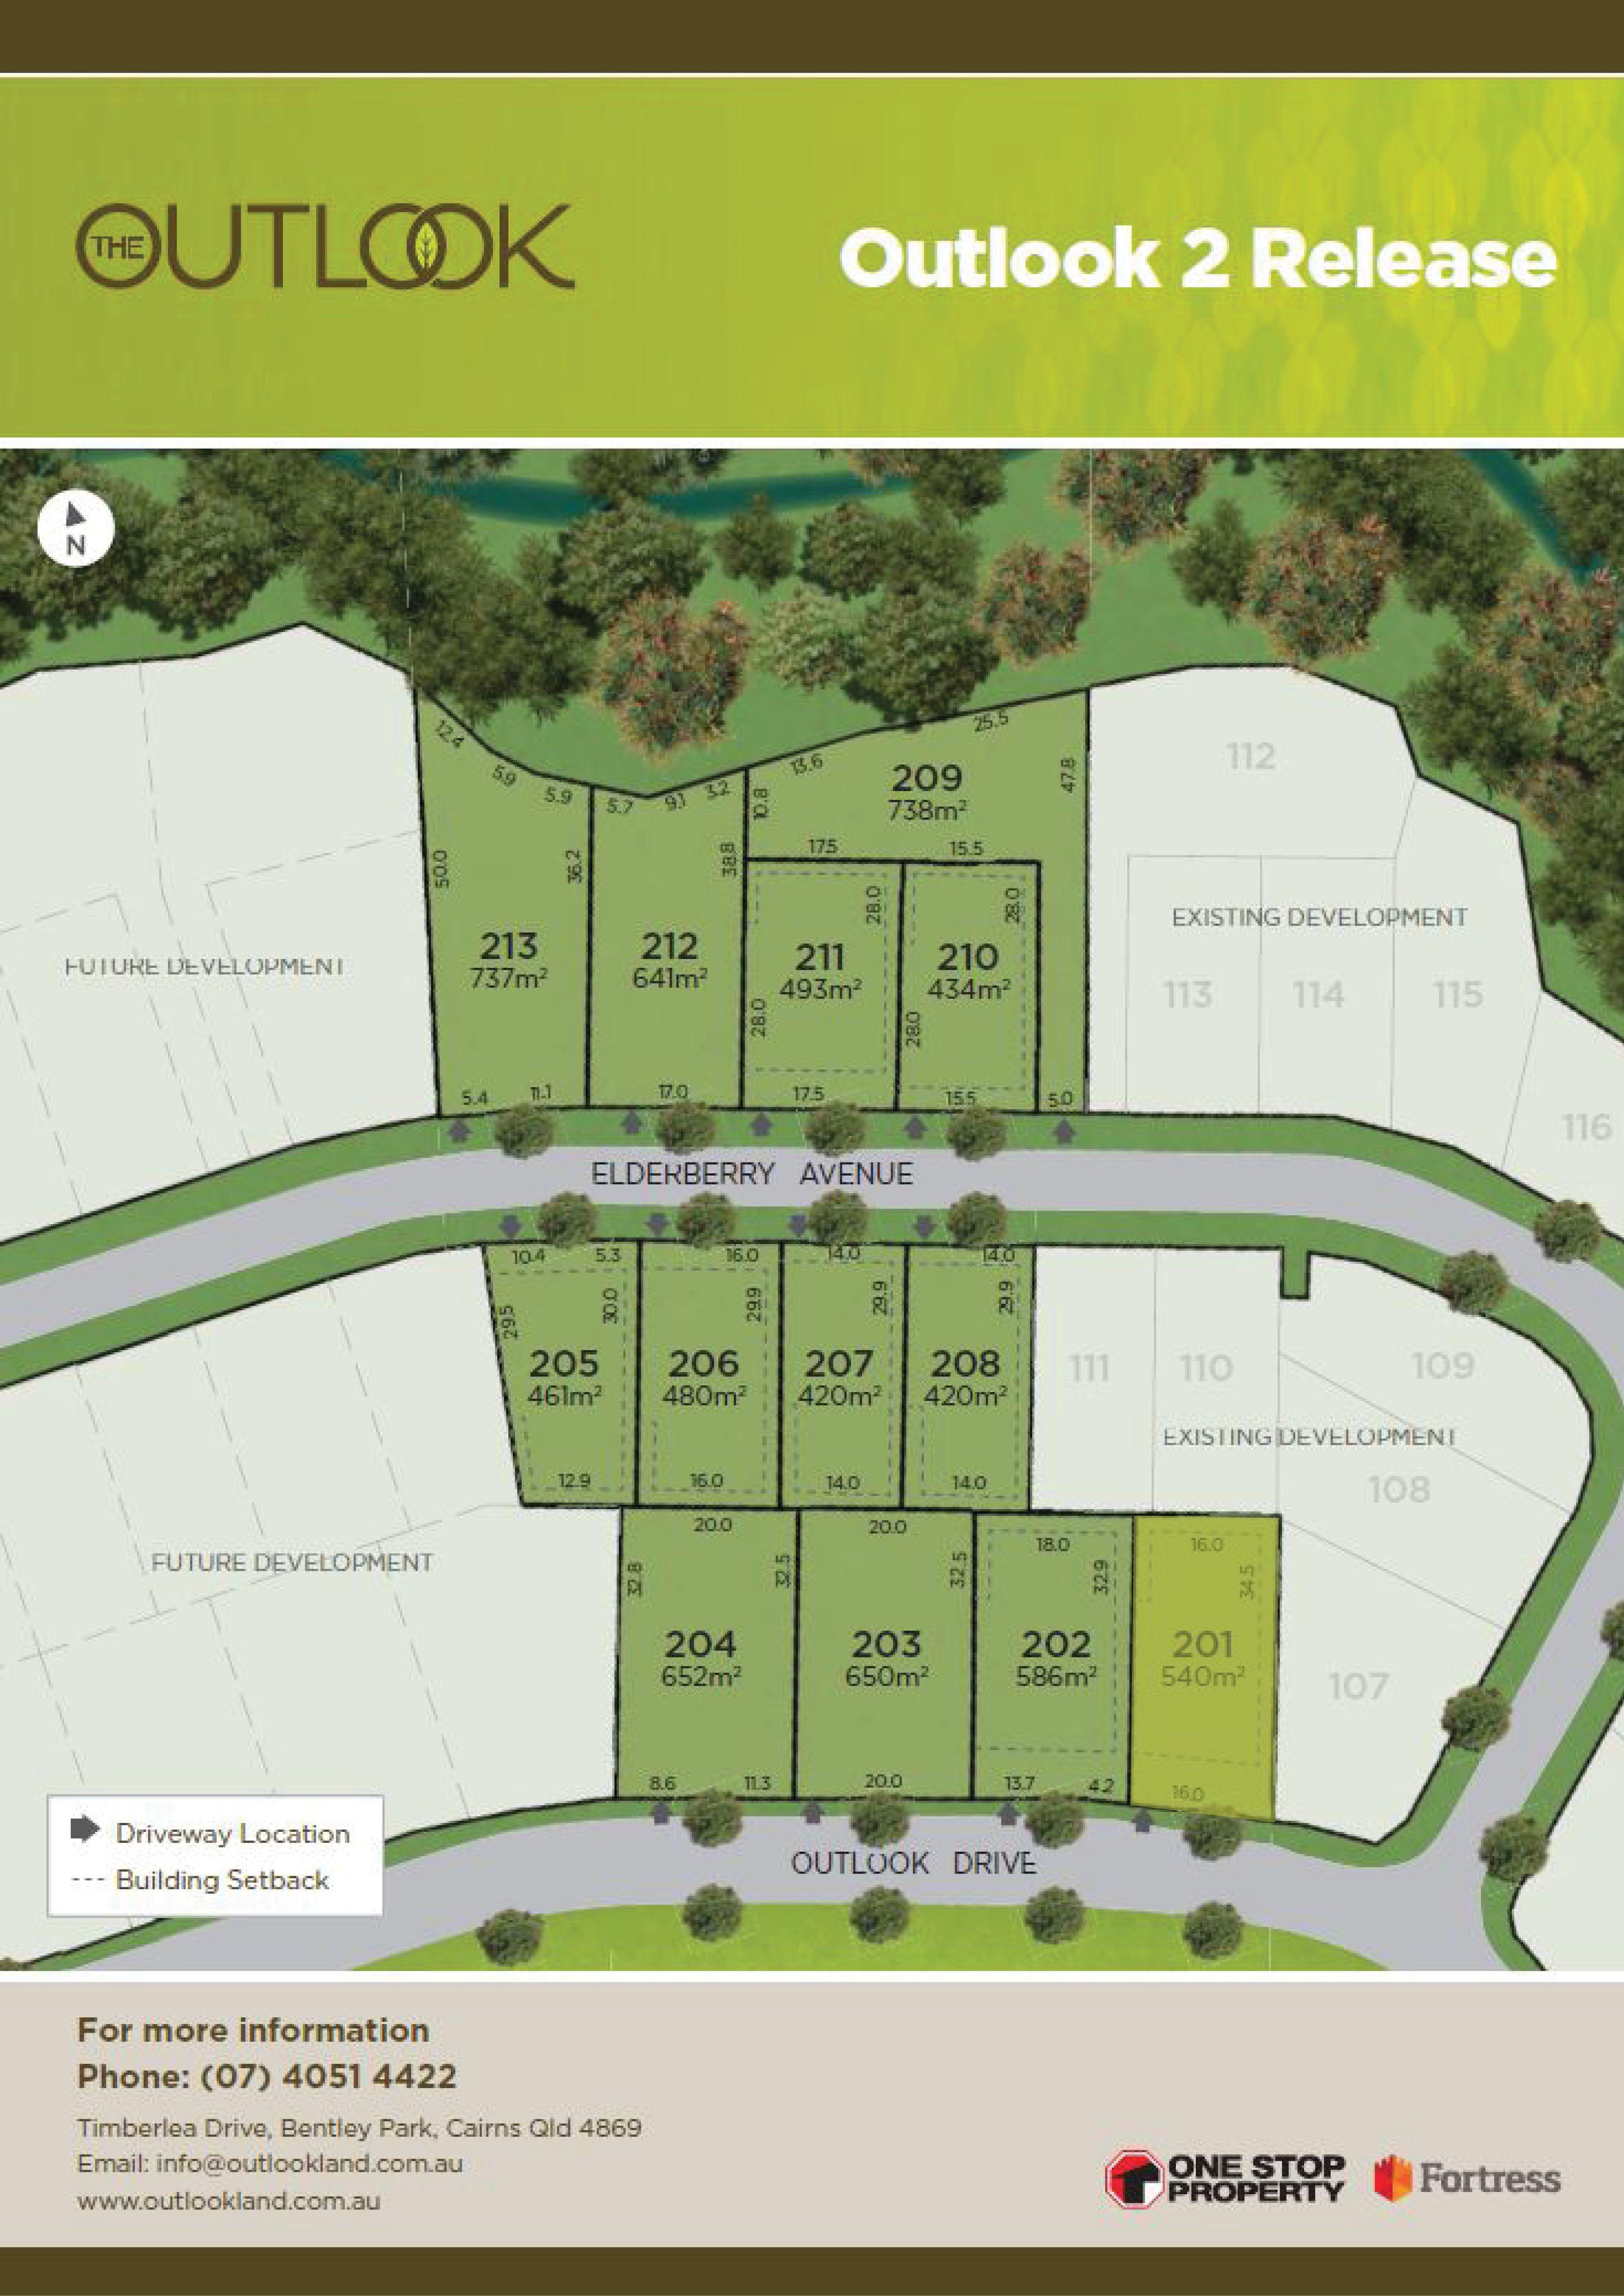 Lot 201 Outlook Drive, Bentley Park QLD 4869